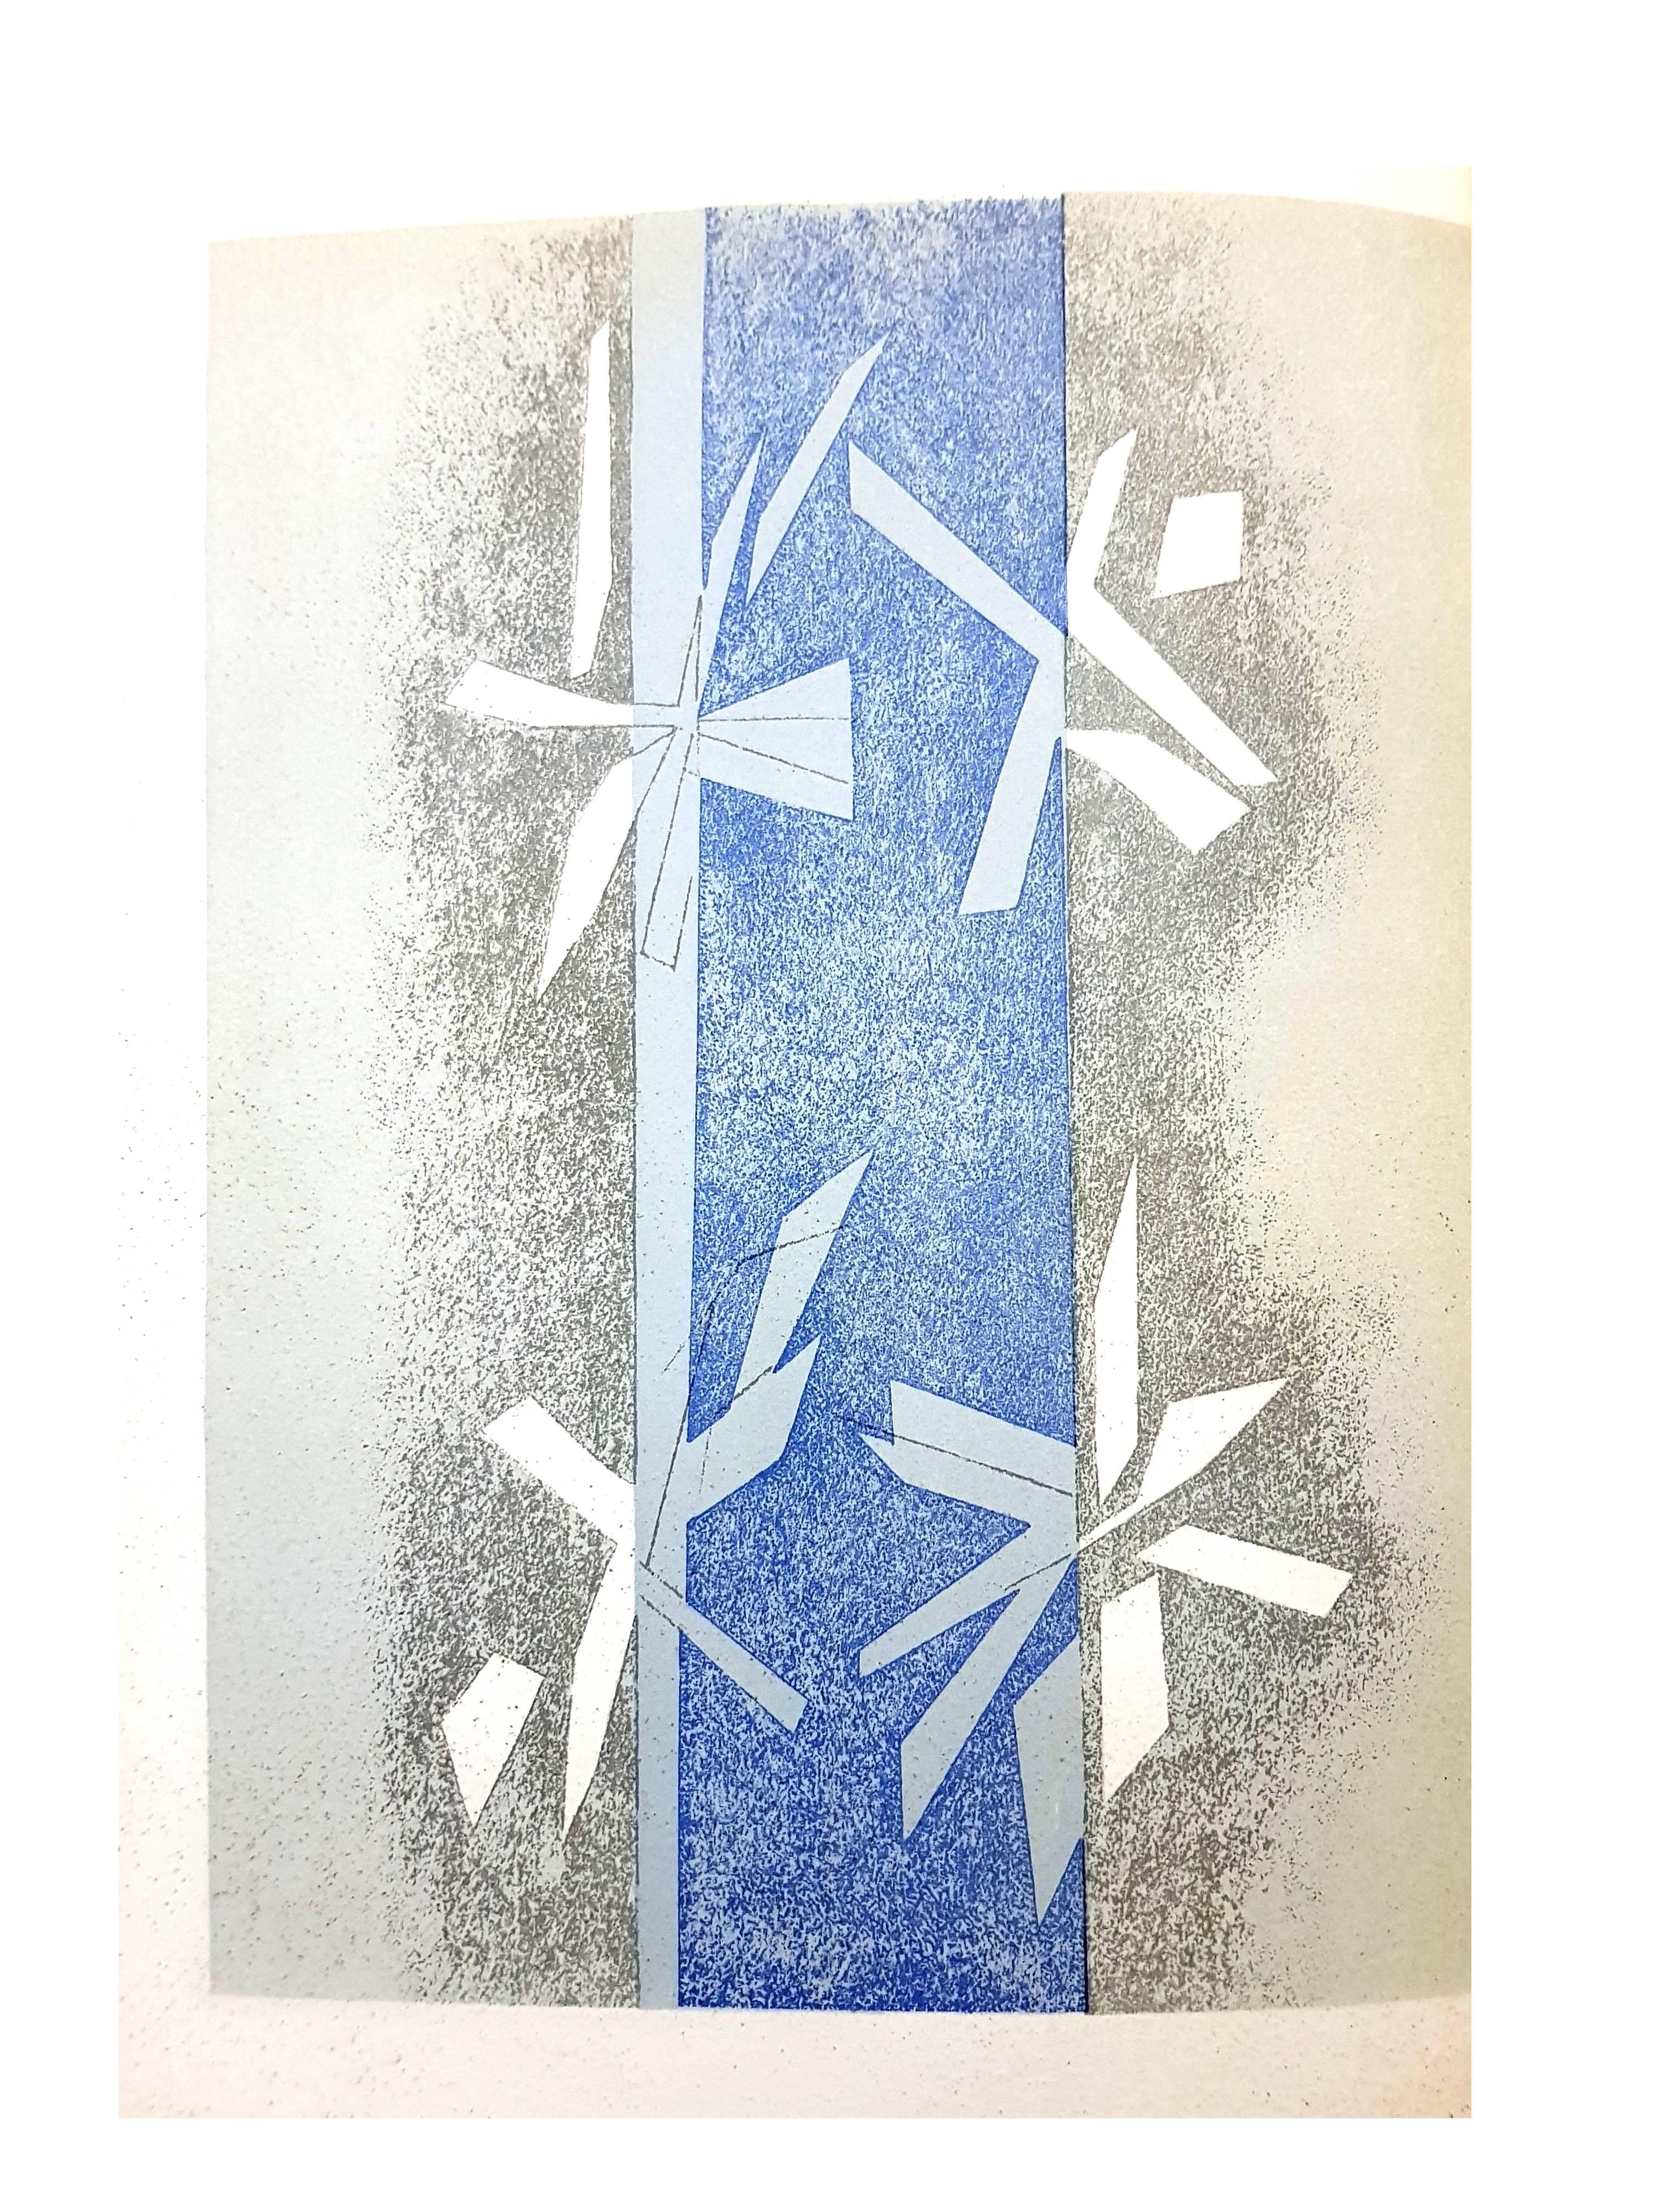 André Beaudin - Composition - Lithograph